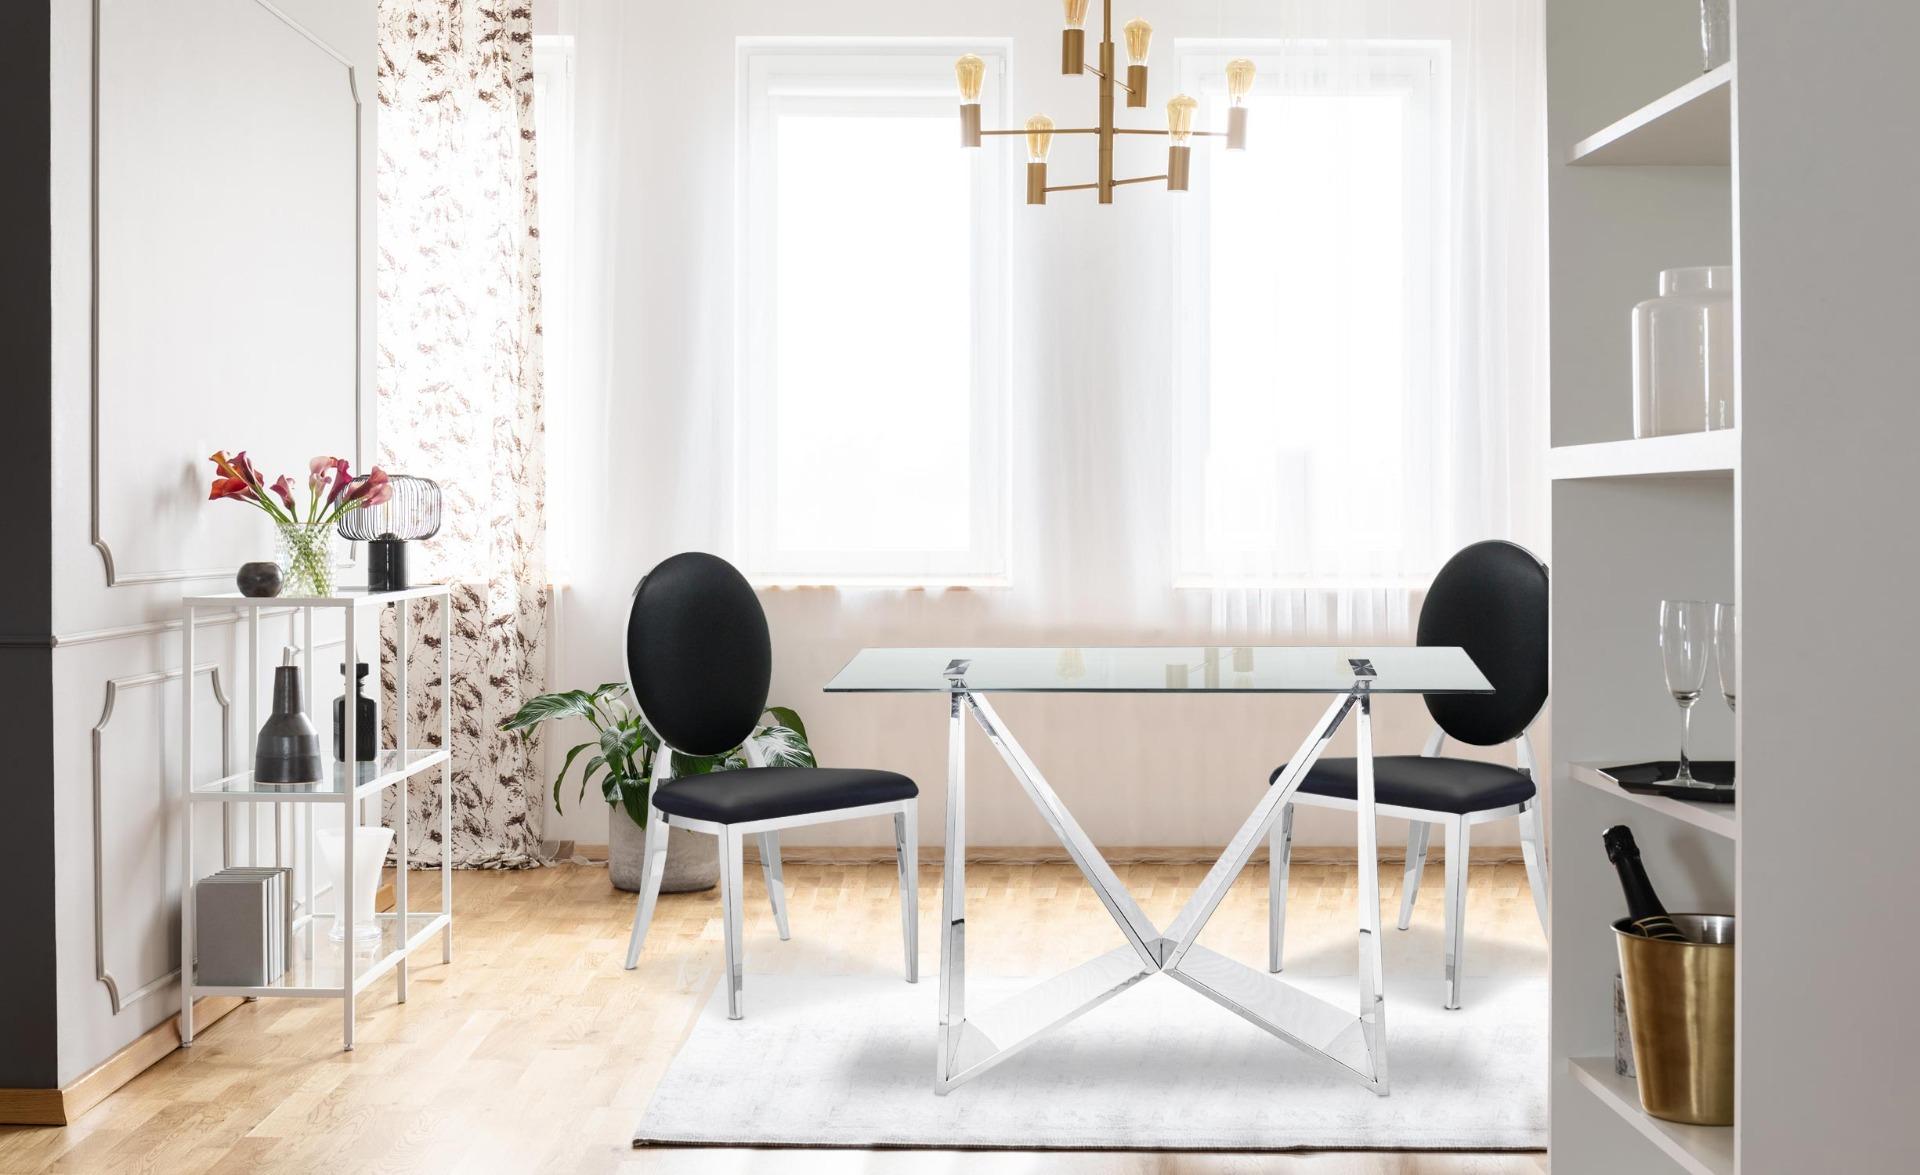 Set di 2 sedie a medaglione Sofia in similpelle nere